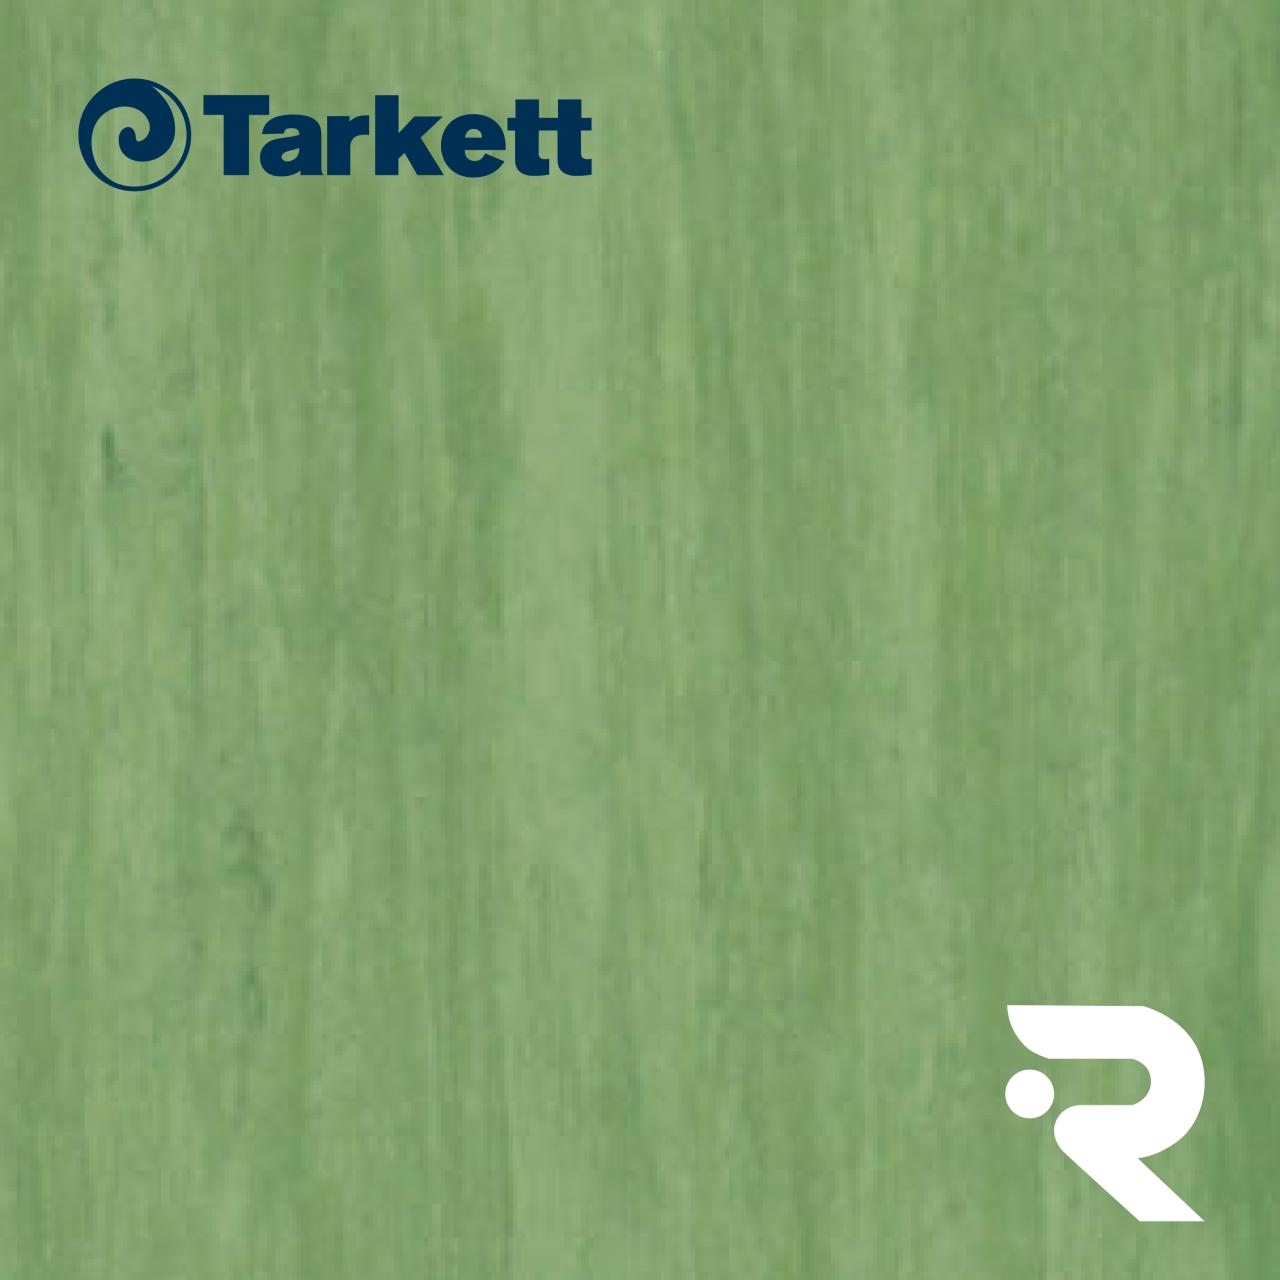 🏫 Гомогенний лінолеум Tarkett   Standard DARK GREEN 0921   Standard Plus 2.0 mm   2 х 23 м